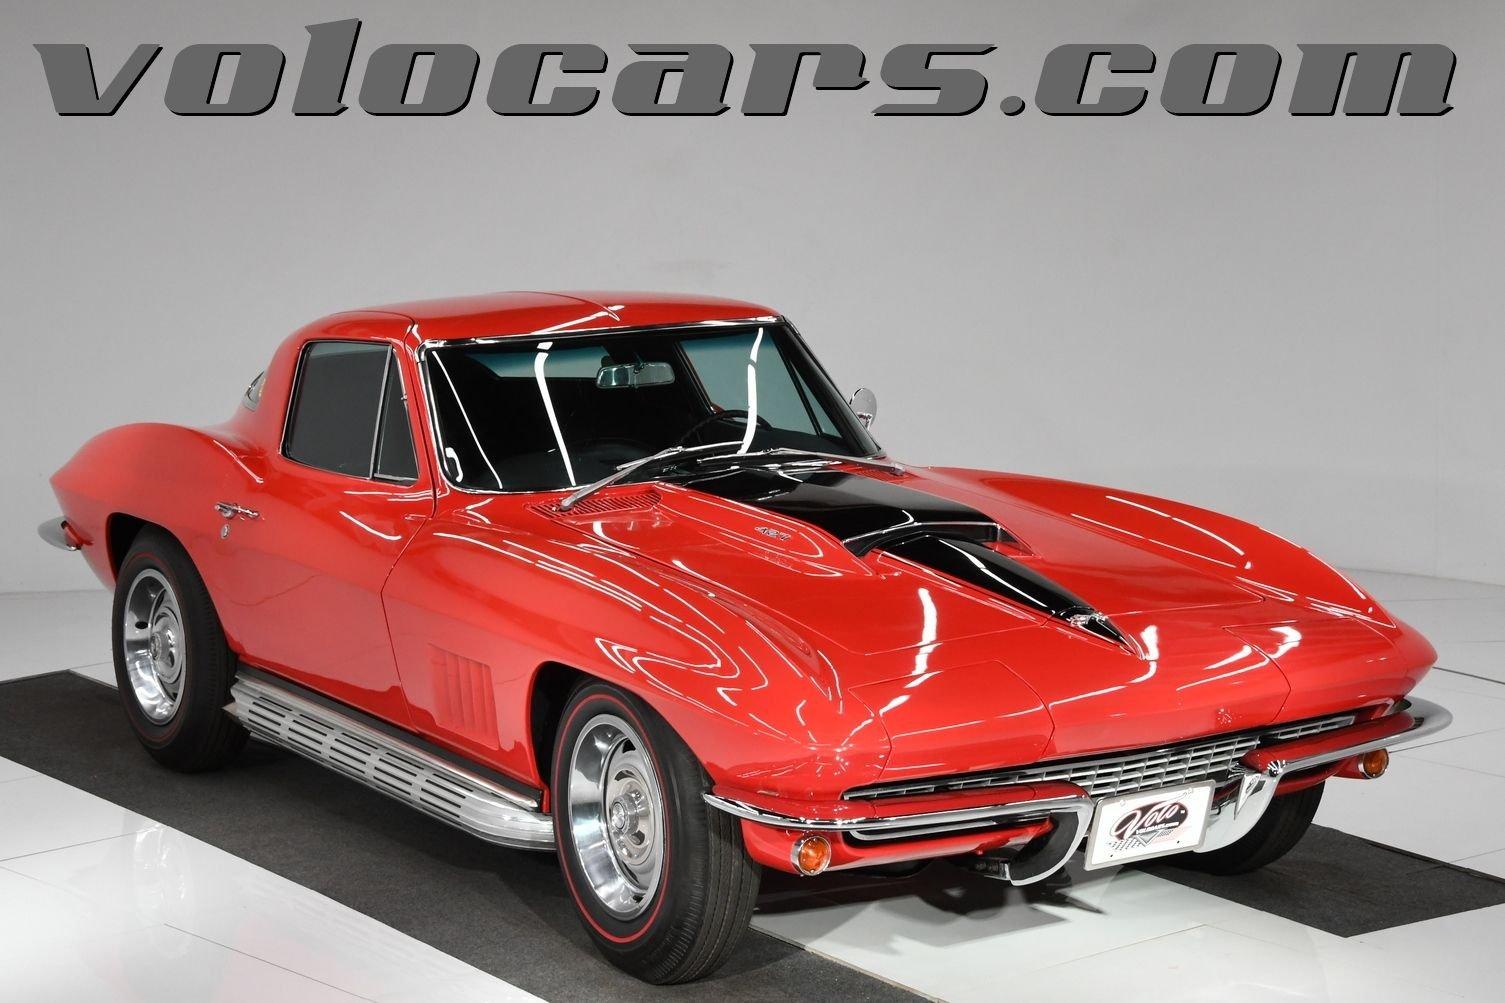 1967 chevrolet corvette l 88 tribute